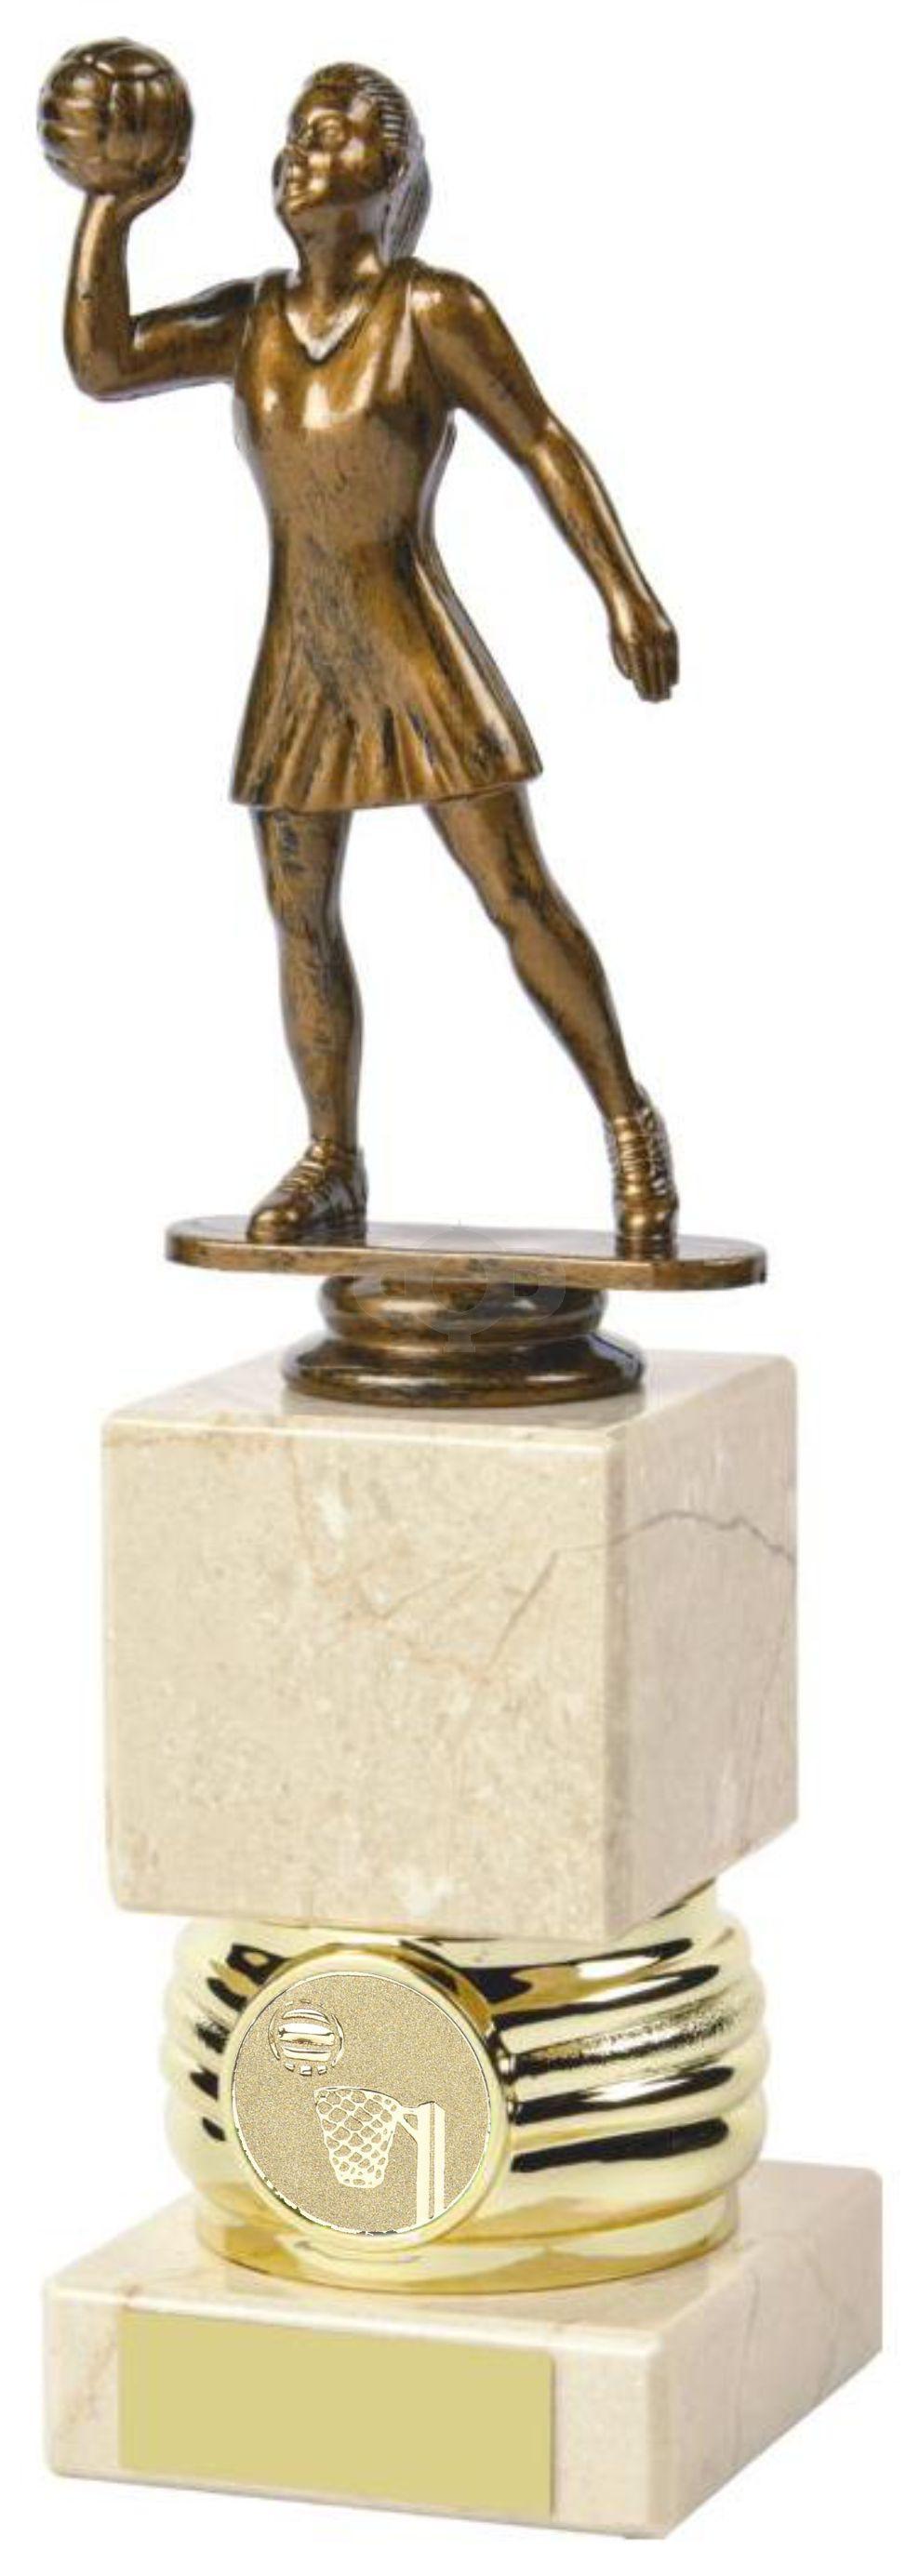 Antique Gold Hockey Awards mounted on Cream Marble